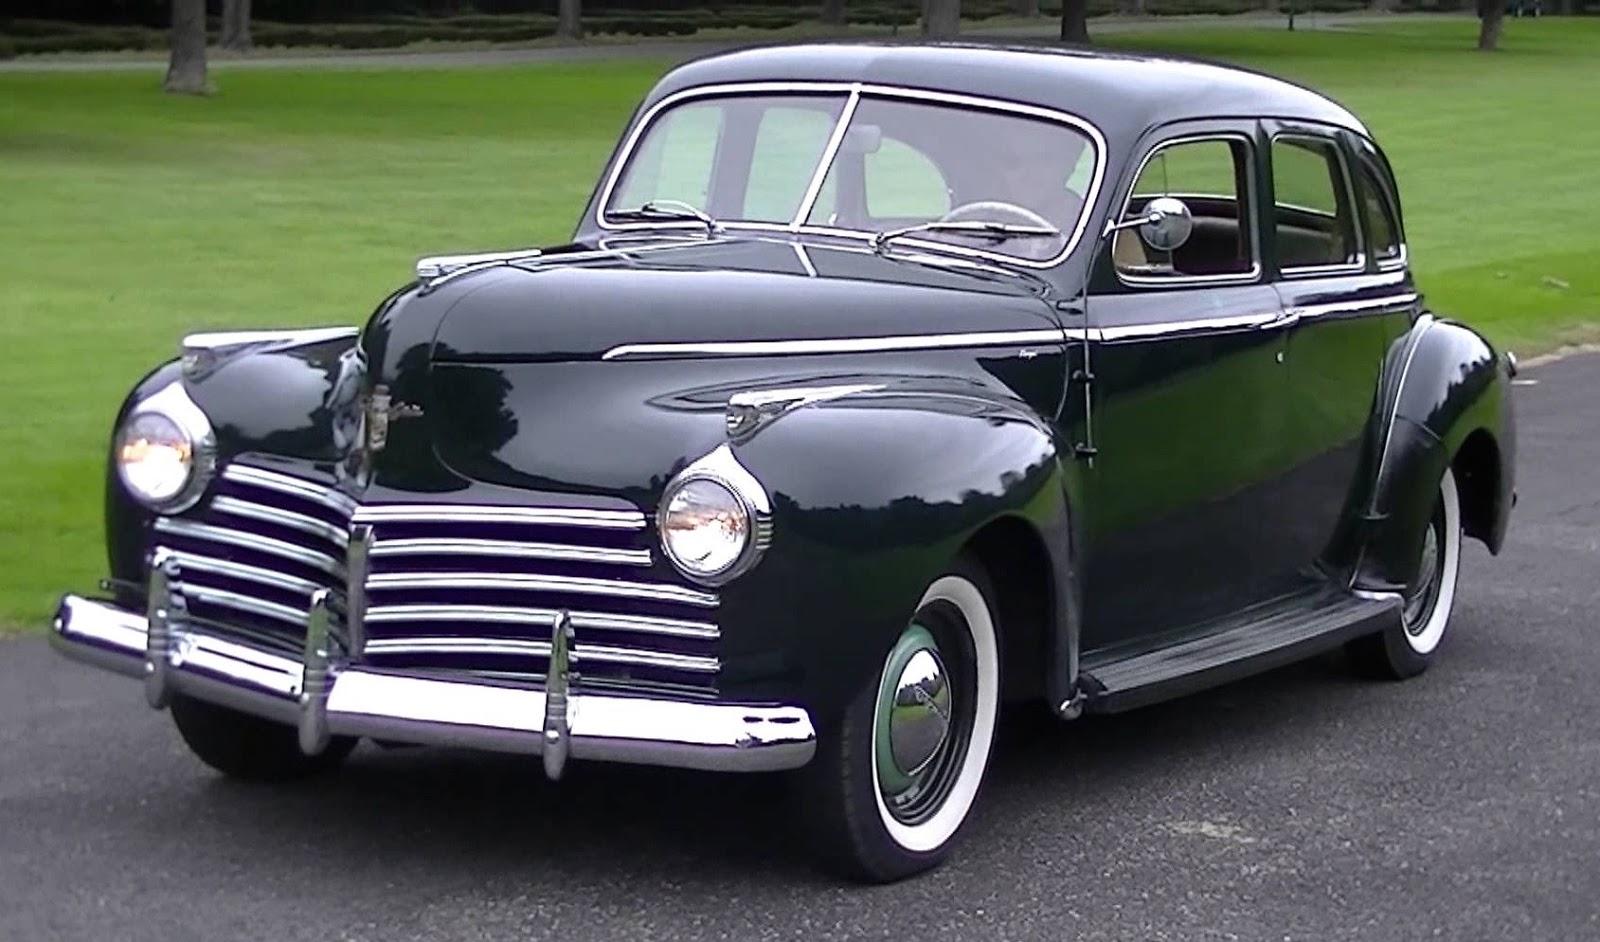 Car Design Style Renault Loved Pontiac Hudson And Chrysler In 1942 1941 Silver Streak Royal Sales Photo